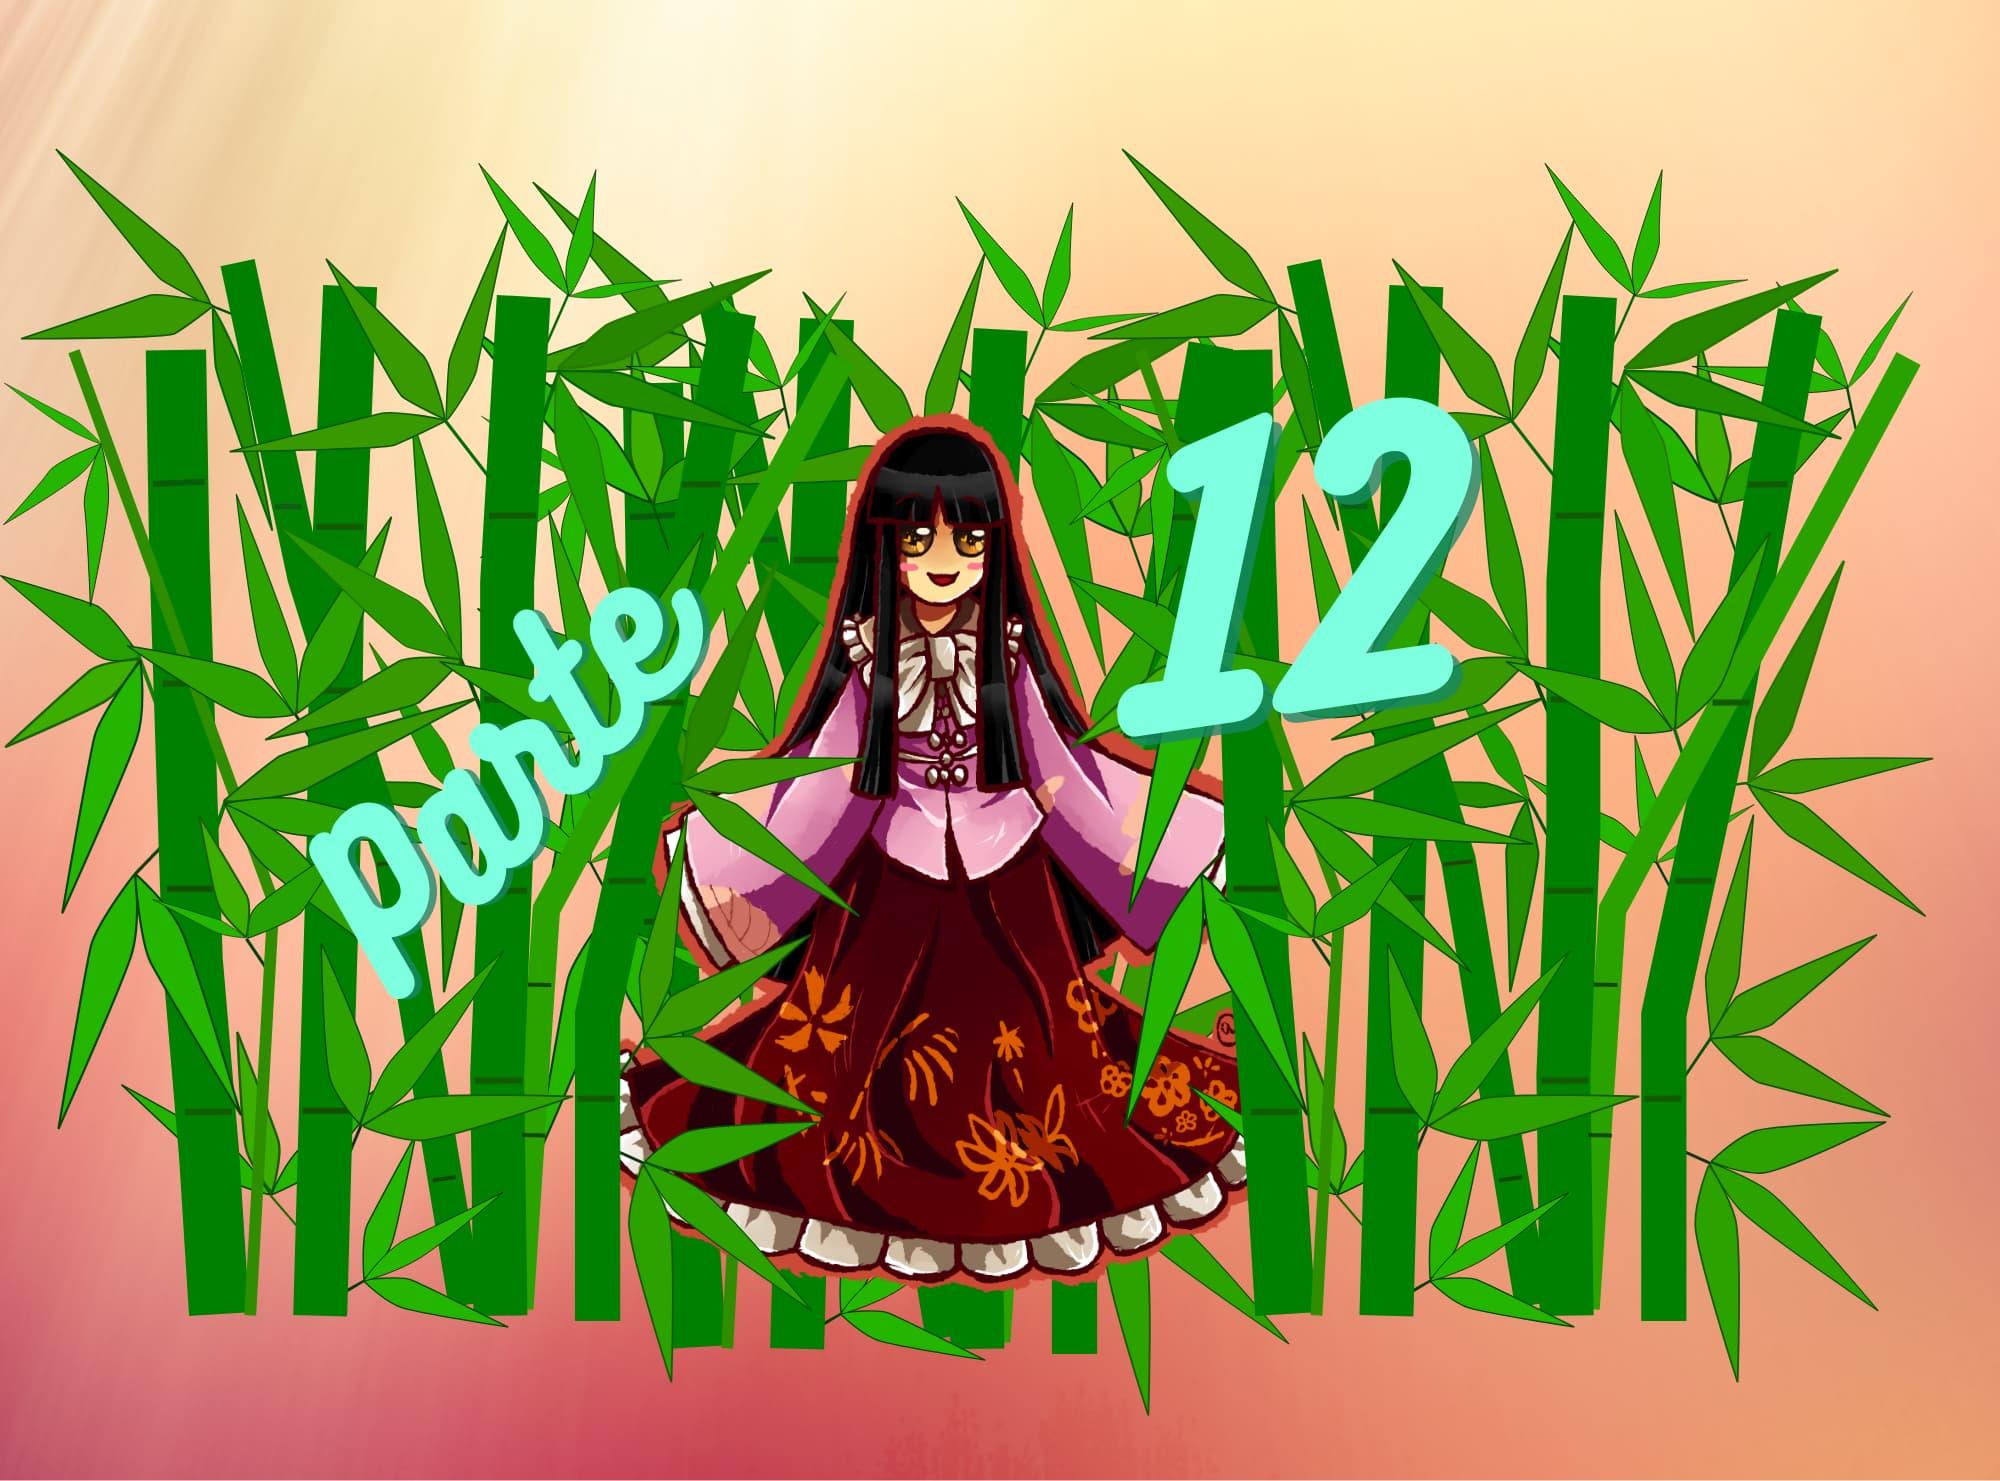 Práctica de lectura N5 de Hiragana: Princesa Kaguya parte 12 (La razón)